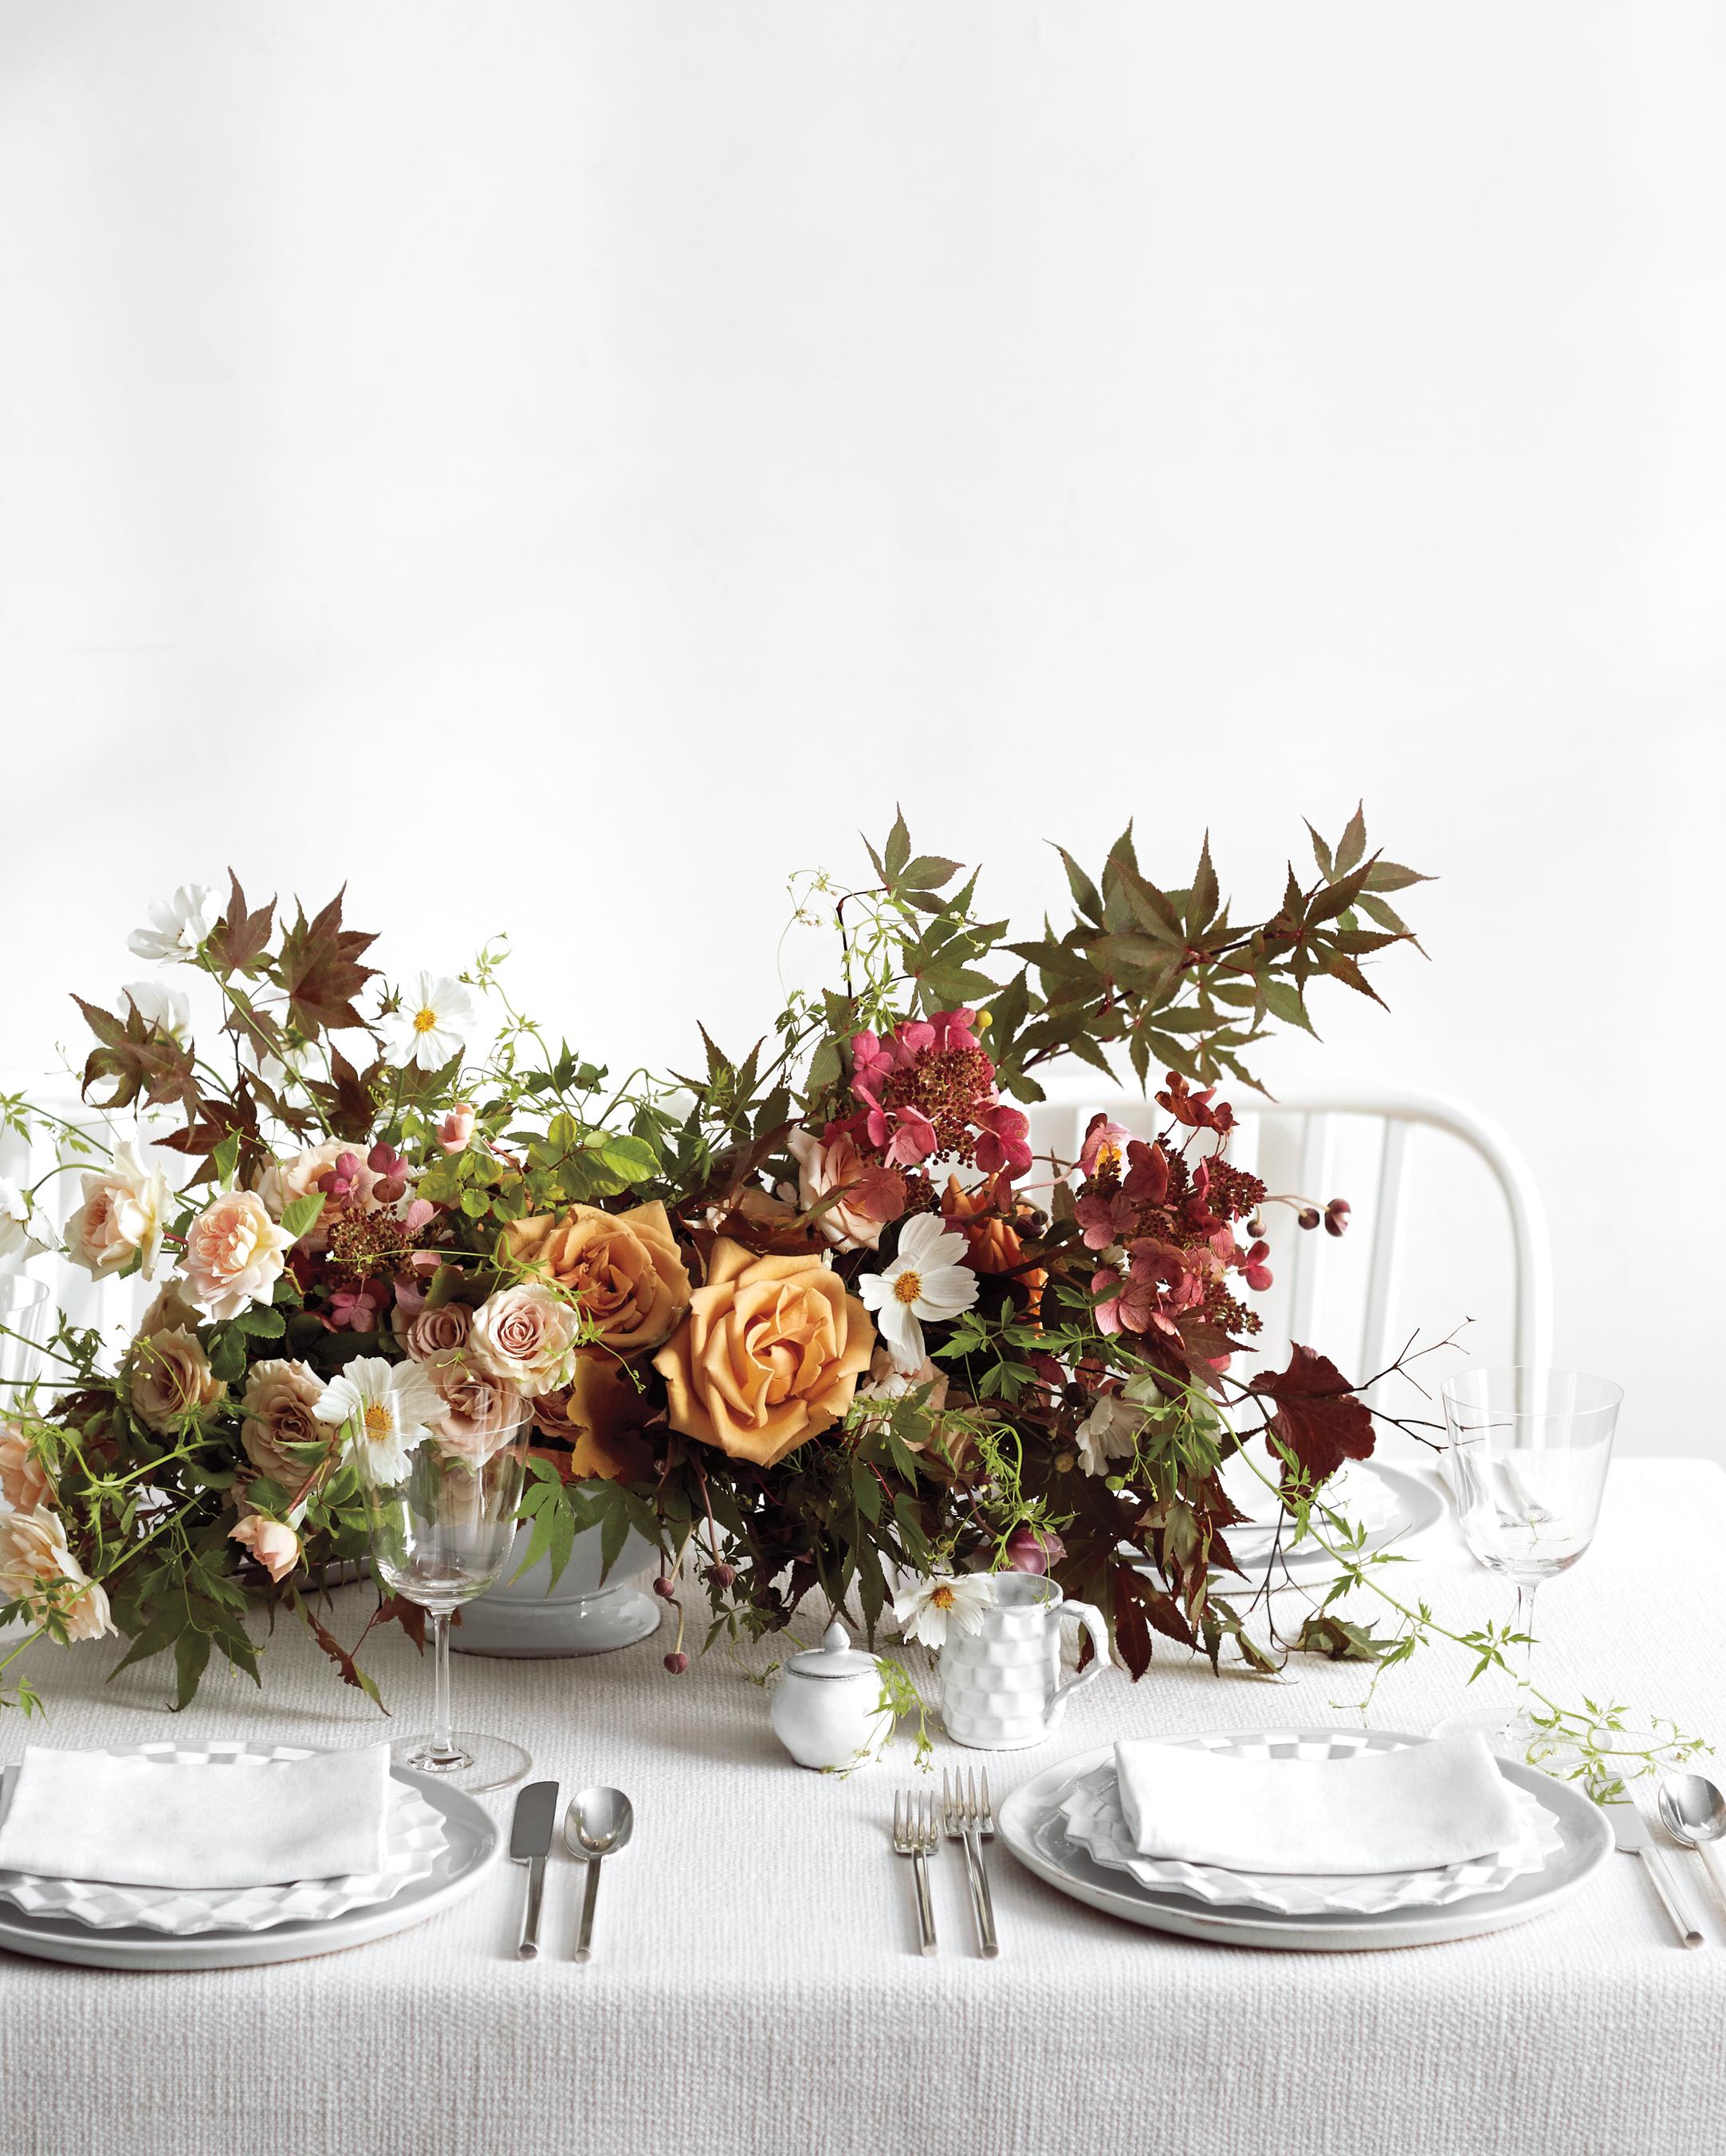 table-centerpiece-298-d111585.jpg